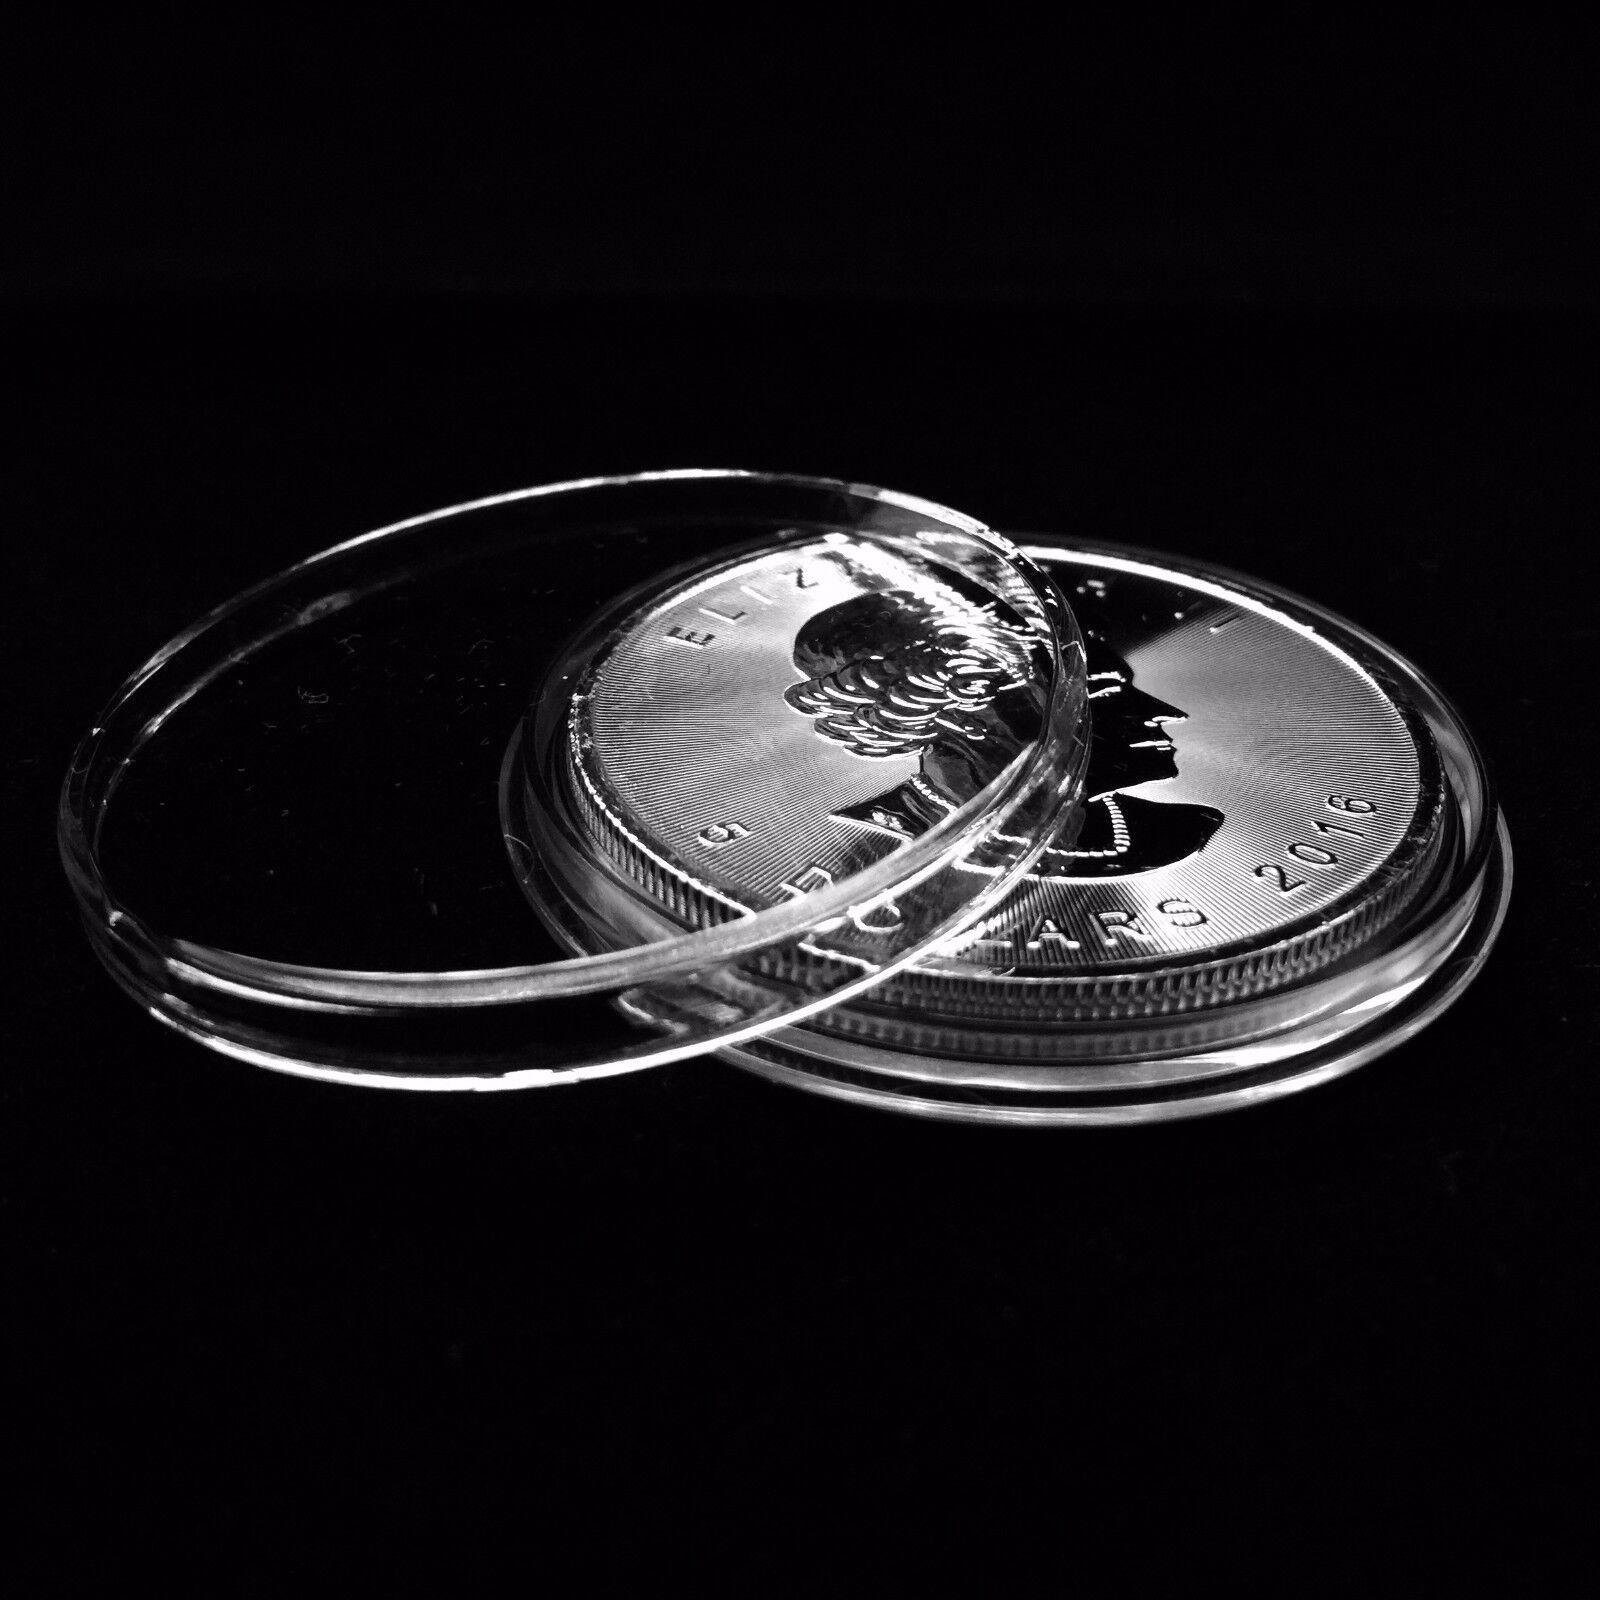 Canadian Silver Maple Leaf Coin Album LIGHTHOUSE GRANDE ENCAP 38mm Pages GREEN